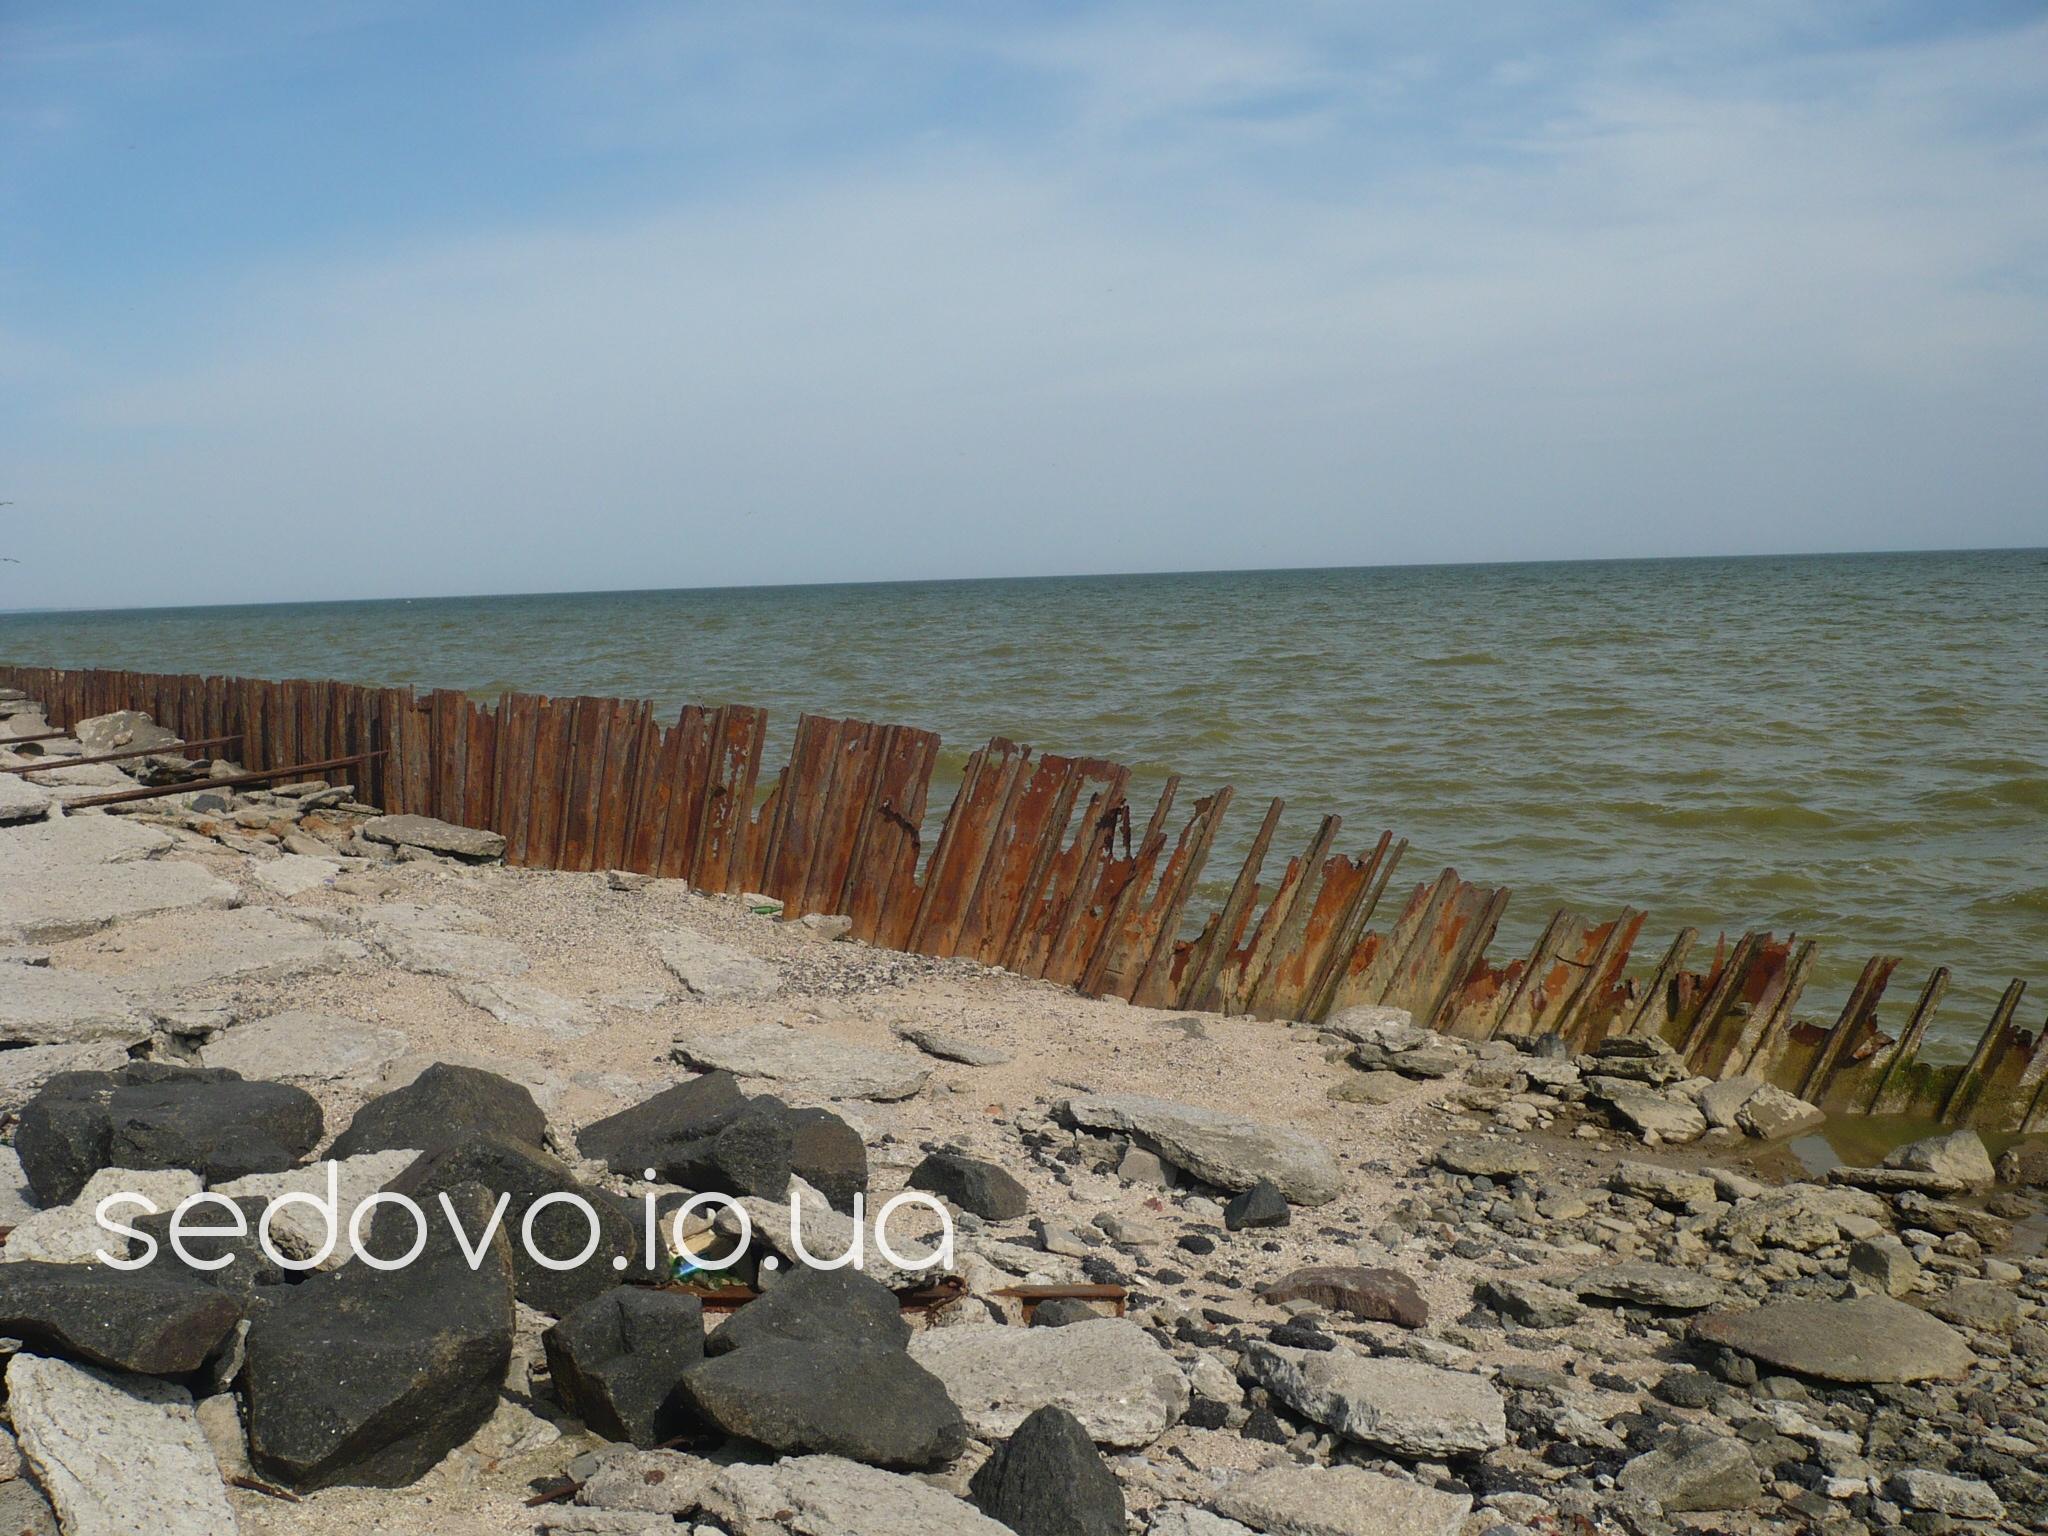 Седово центр пляж недалеко от центра за музеем